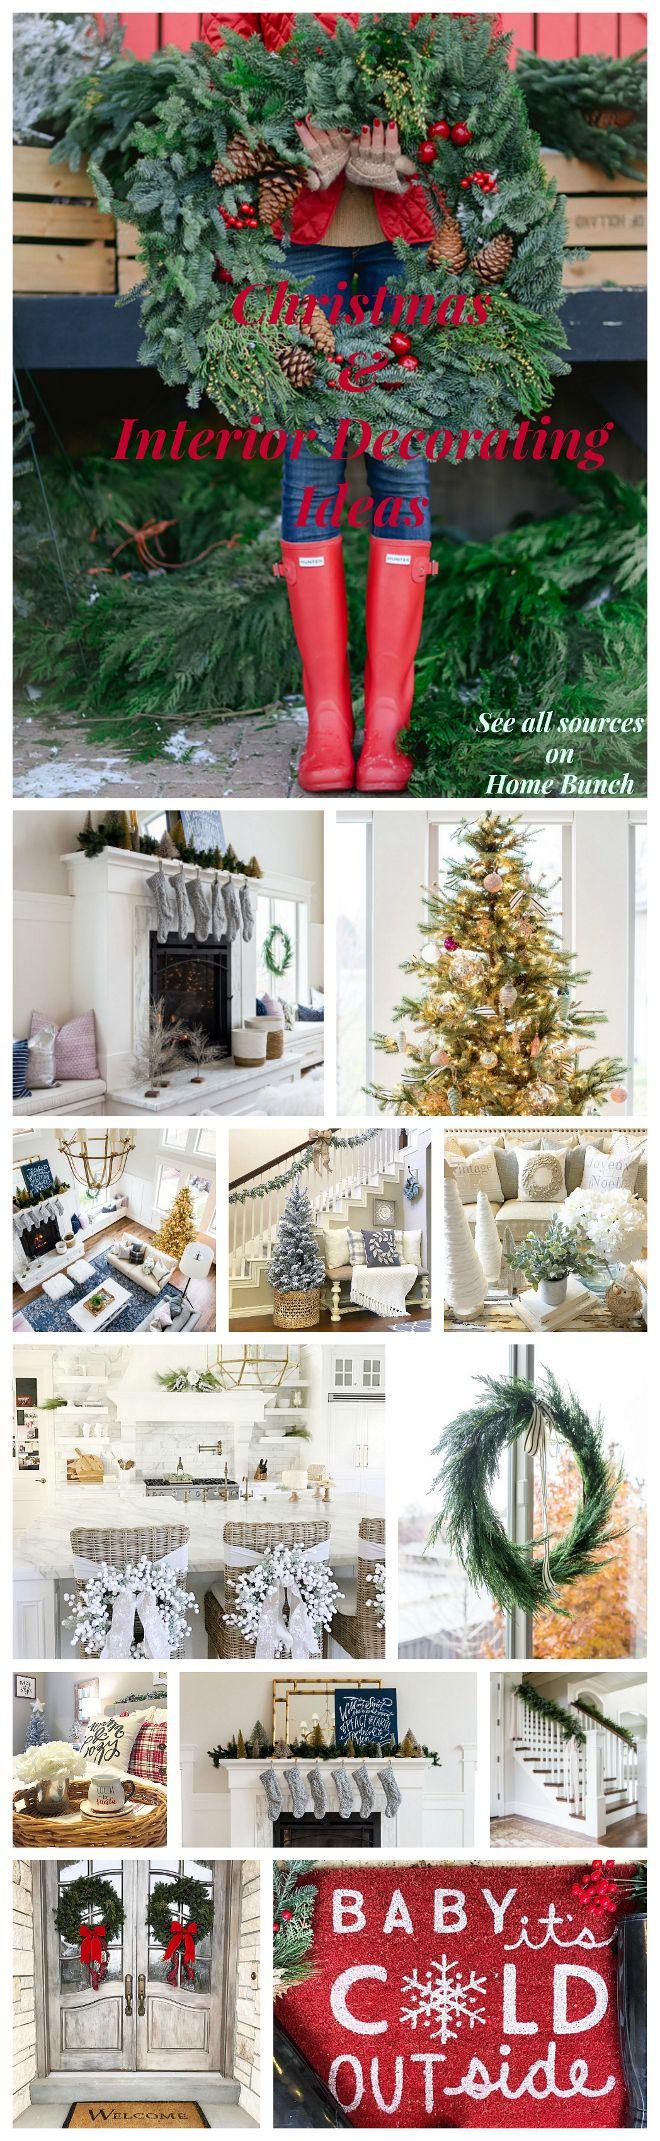 Christmas Interior Decorating Ideas ChristmasInteriorDecoratingIdeas Your HomeChristmas